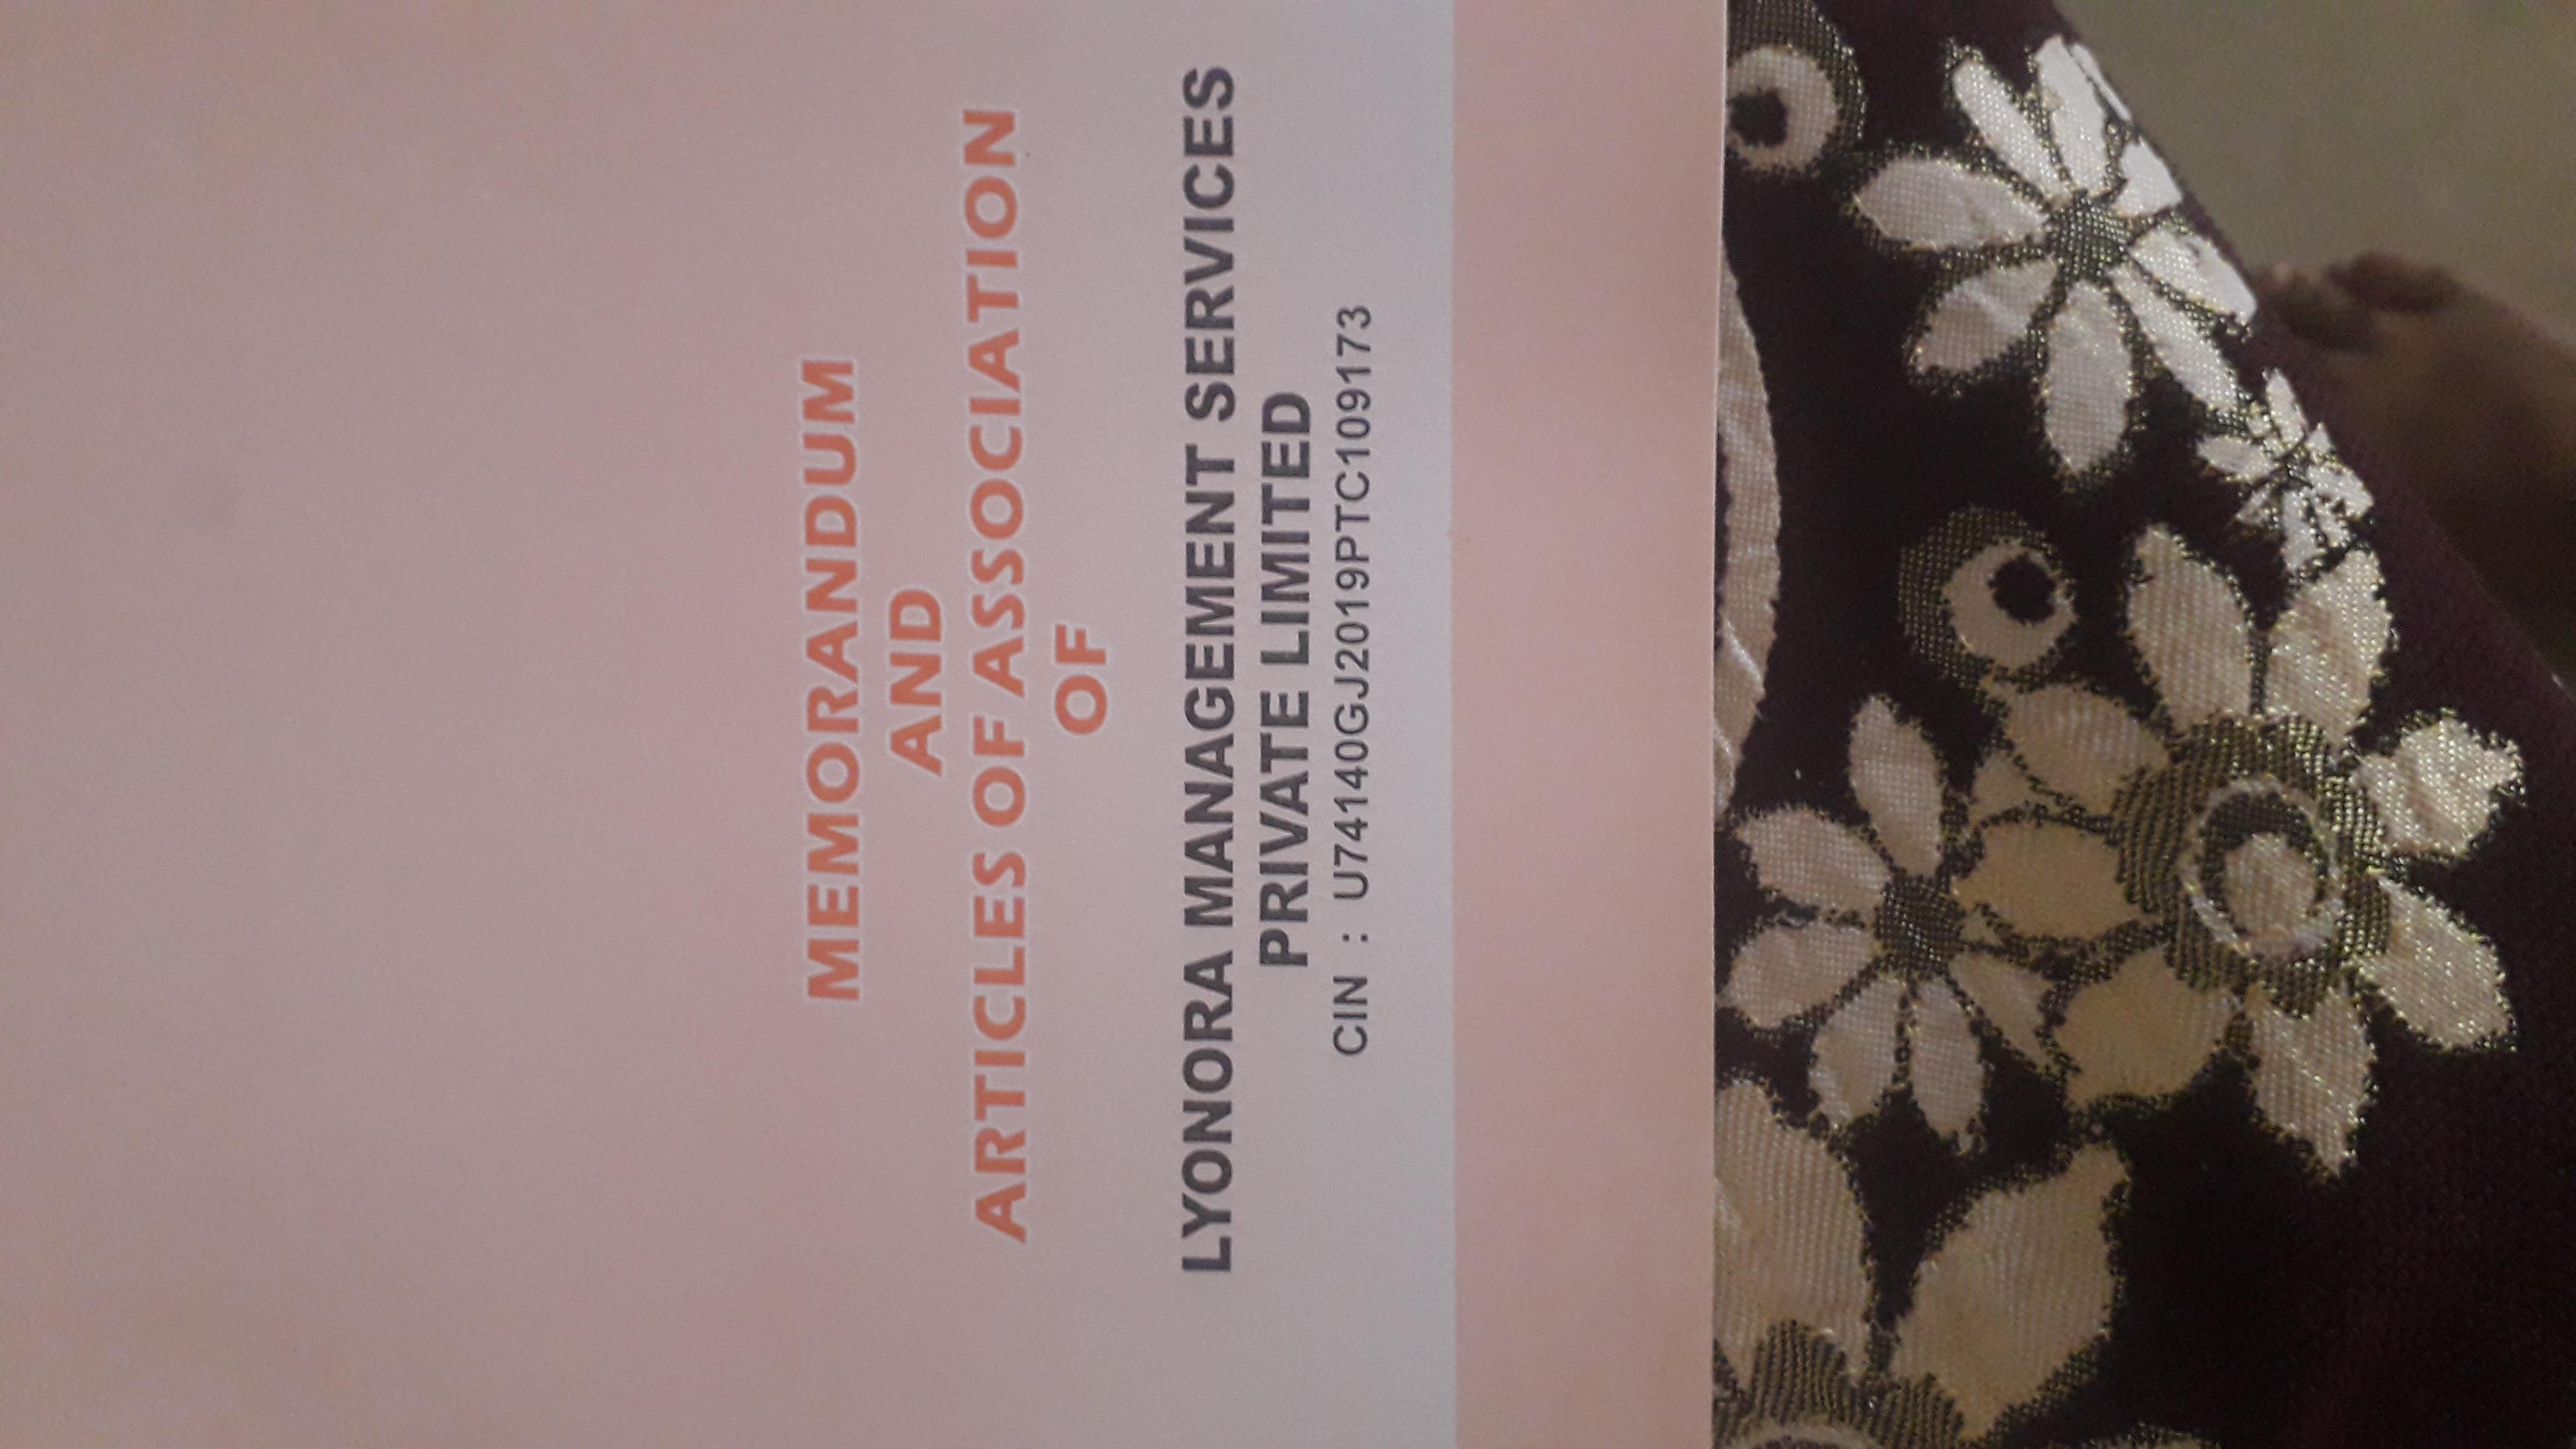 Lyonora manegmant service privet limited